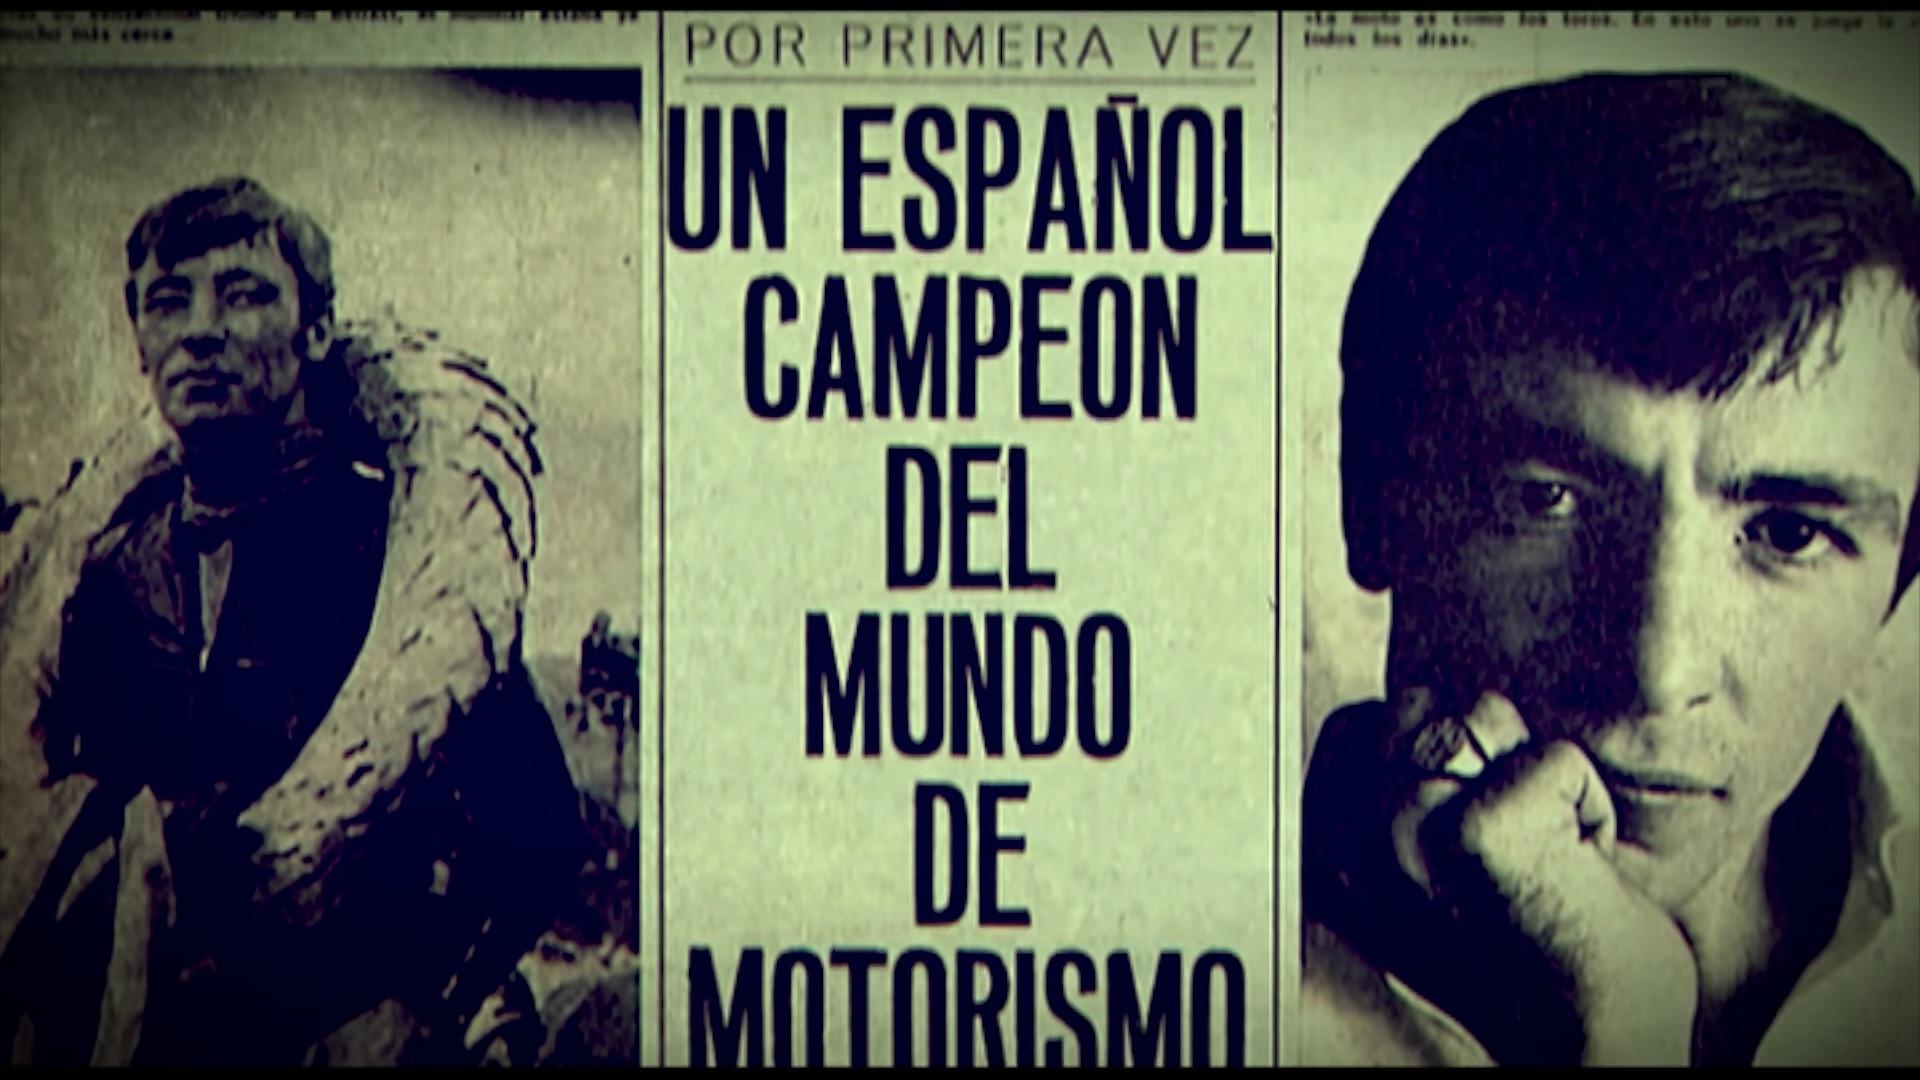 The Only Choice, el vídeo homenaje a Ángel Nieto de su sobrino Fonsi Nieto